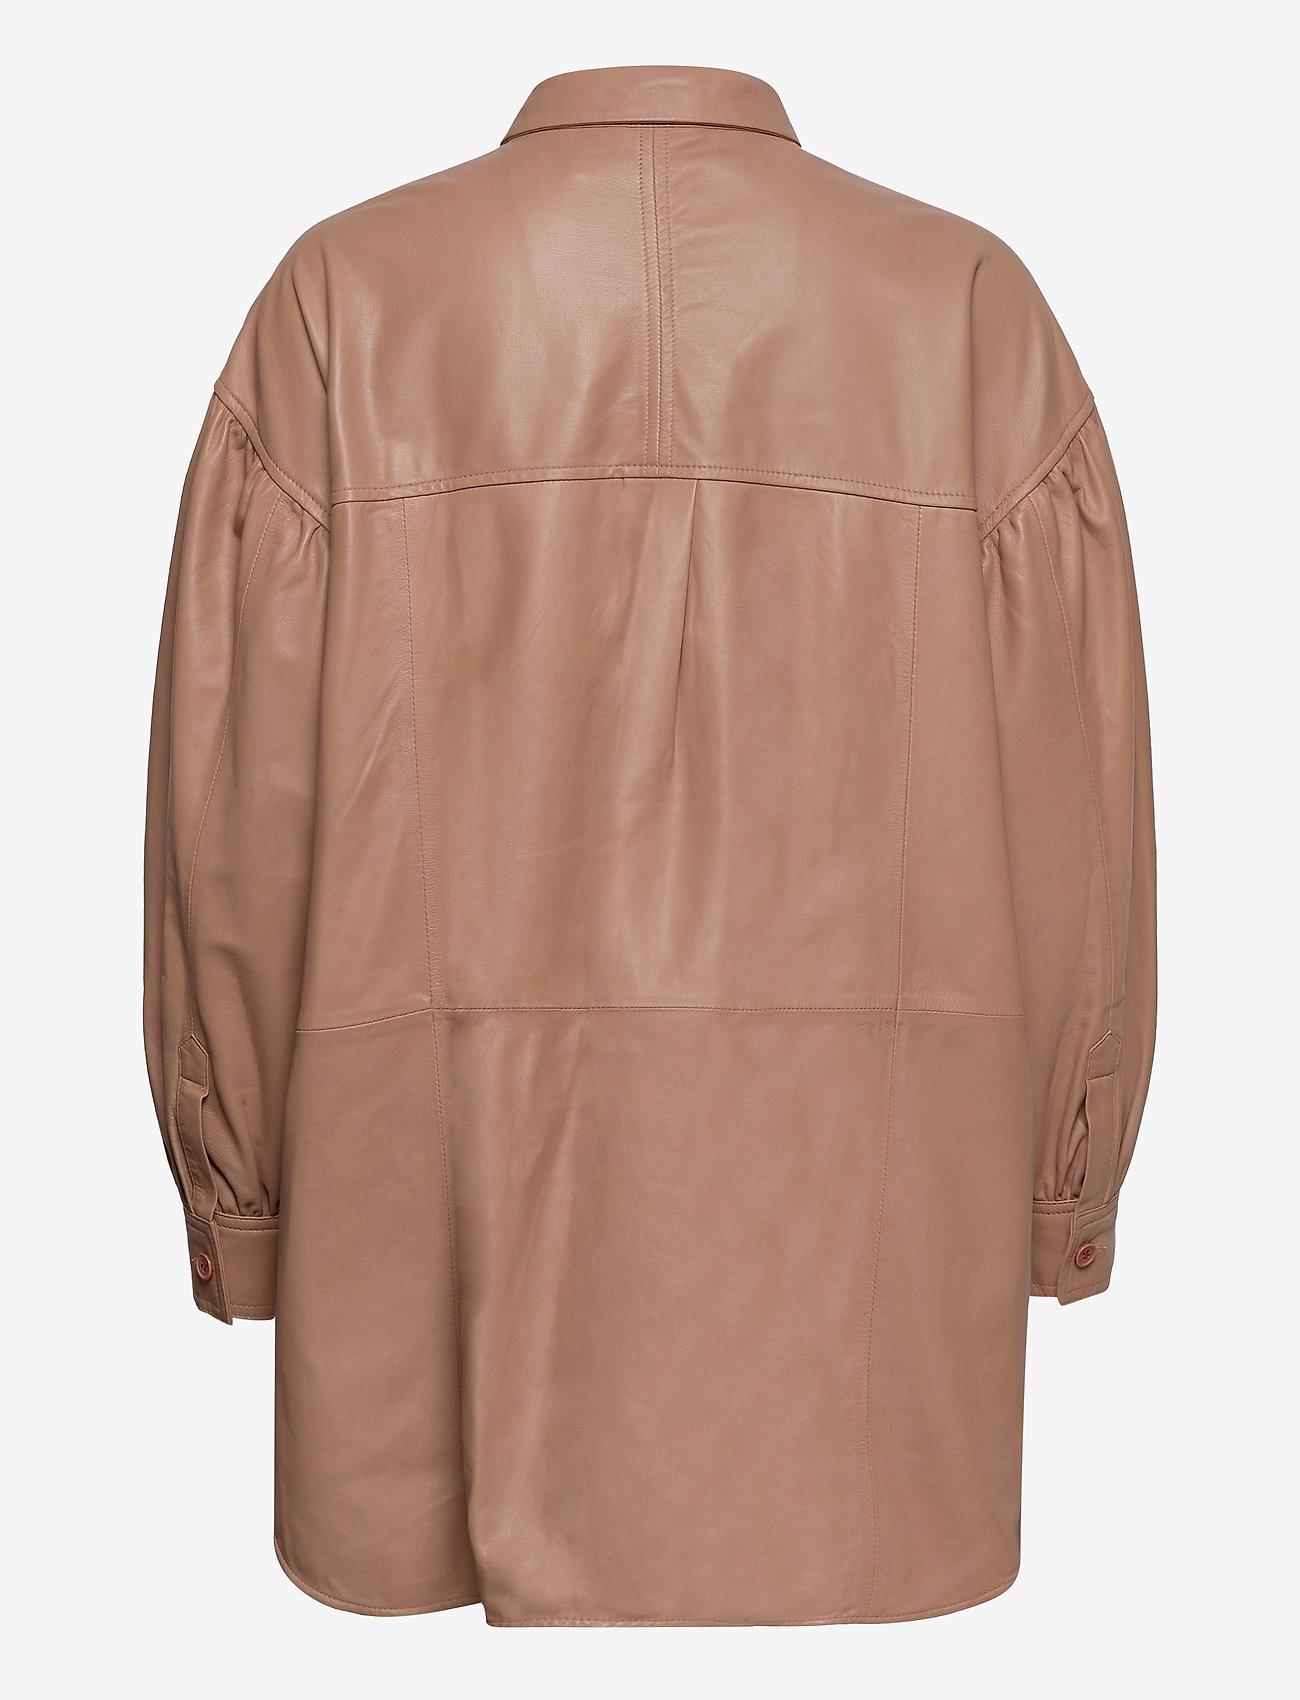 MDK / Munderingskompagniet - Emma leather shirt - overshirts - praline - 1